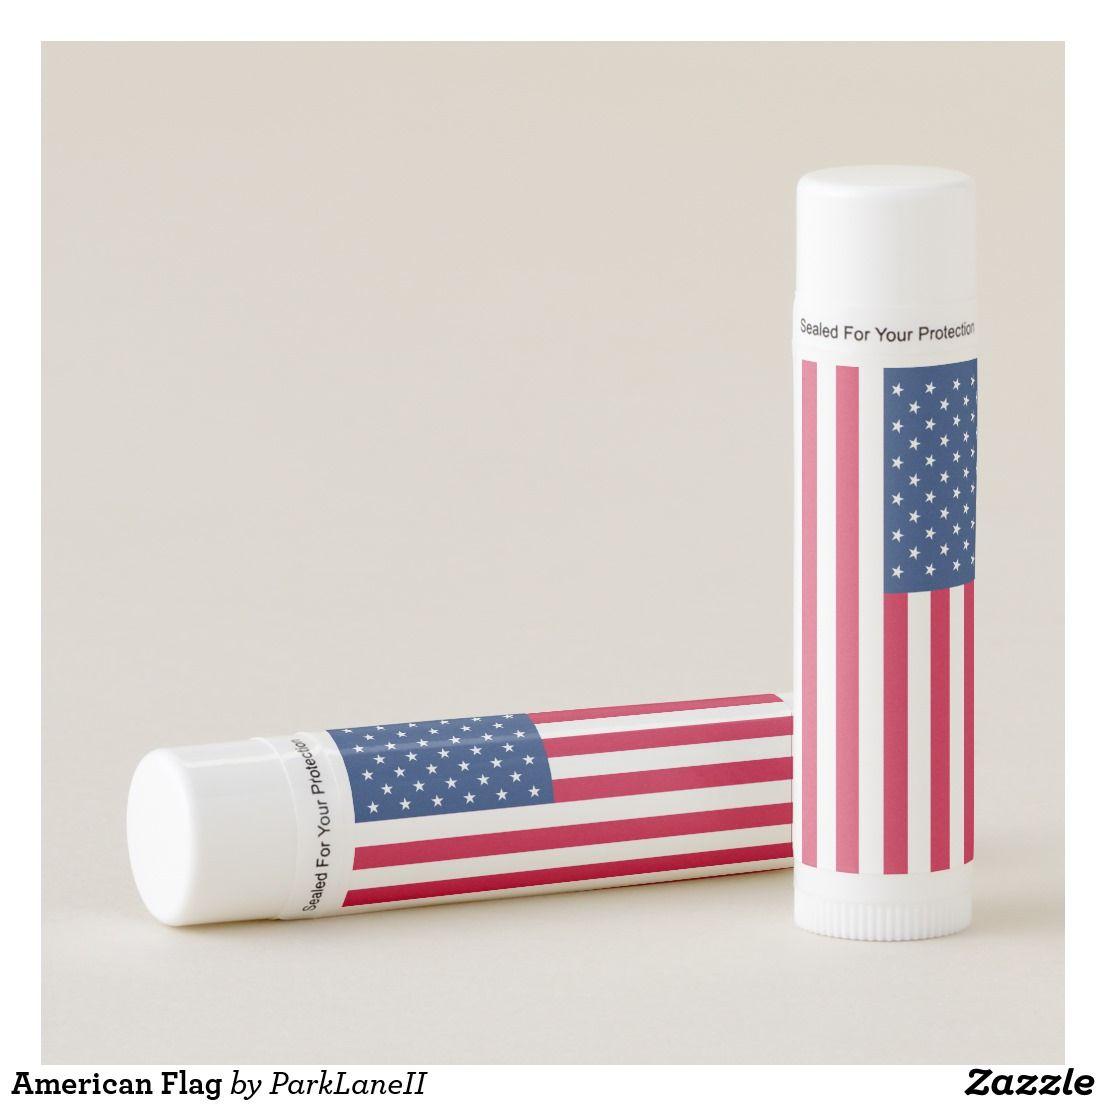 American Flag Lip Balm Americangirl American Flag Lipbalm Usa Usflag Starsandstripes Newparklane Zazzle Patrioticgi The Balm Lip Balm Patriotic Lips